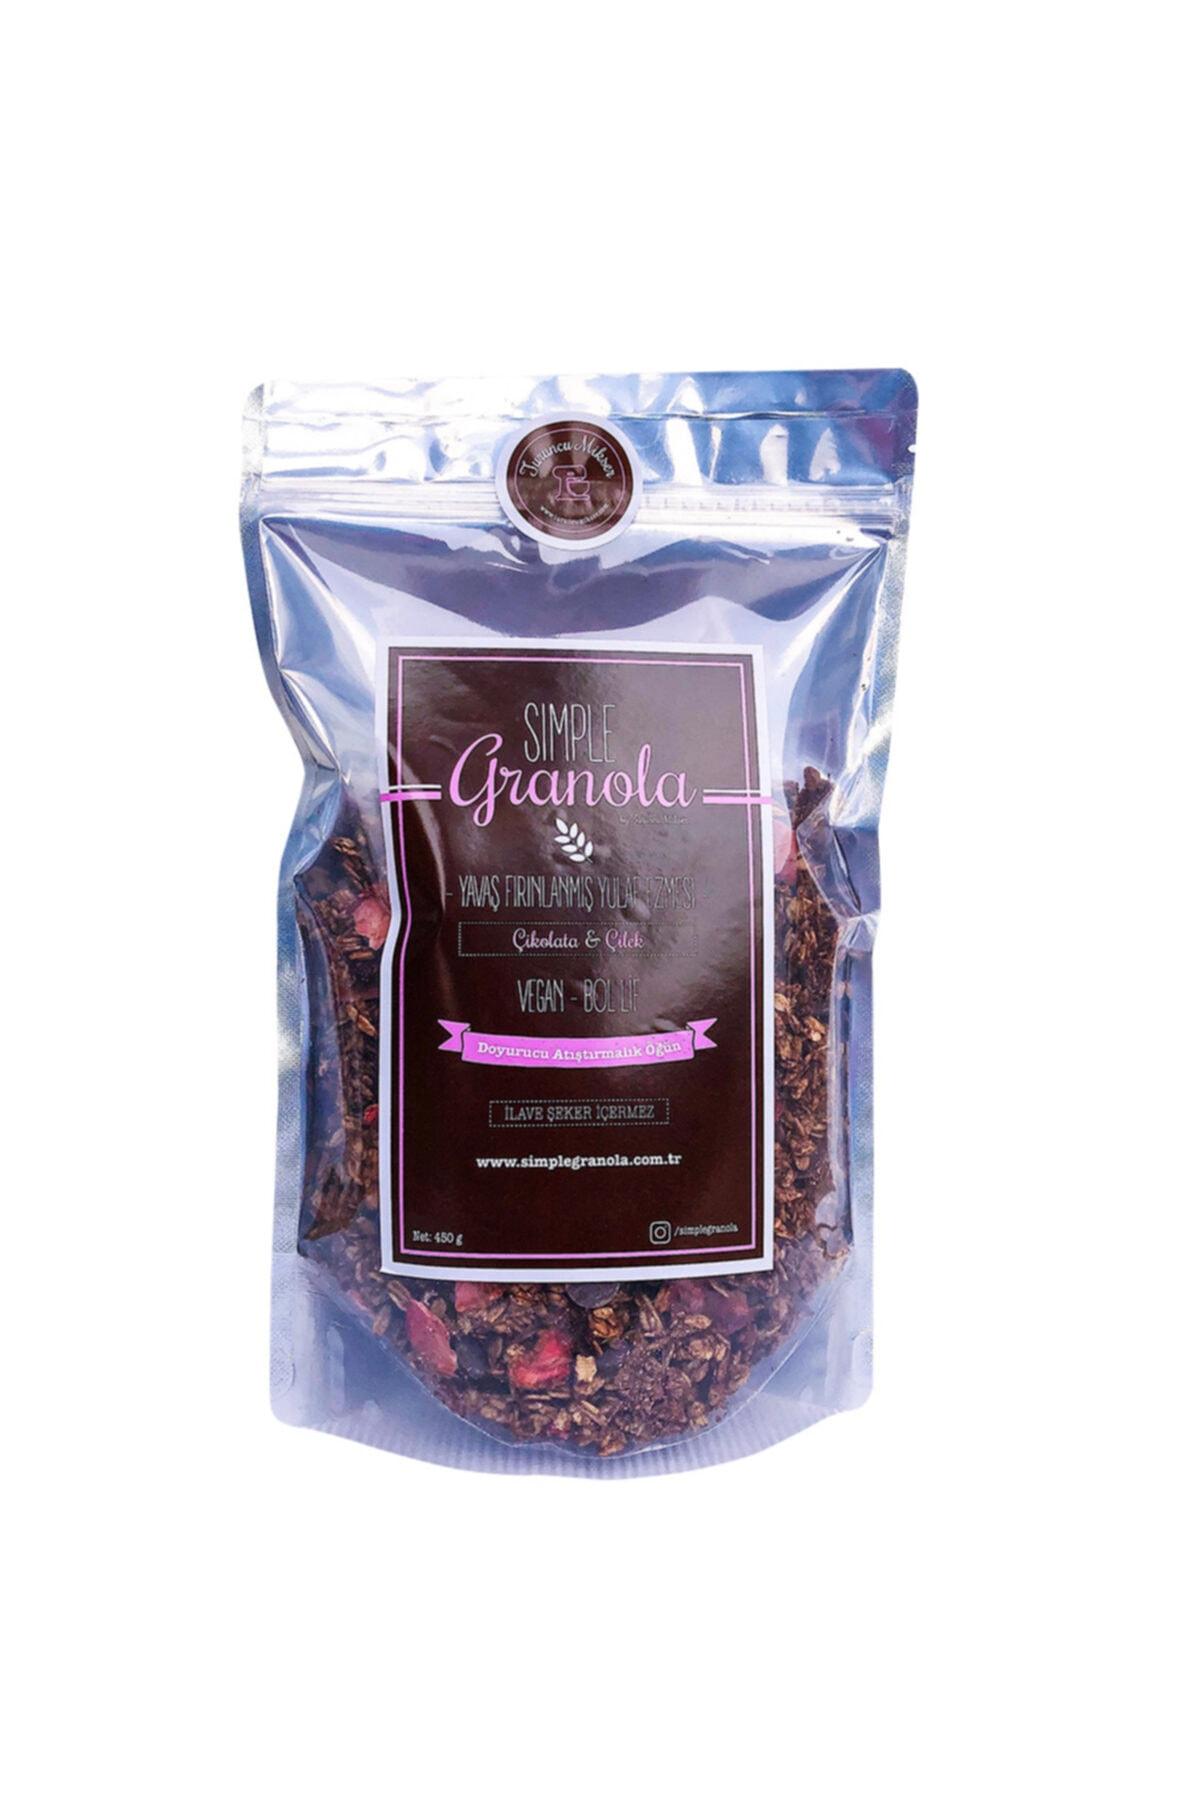 Simple Granola Çikolata Ve Çilekli Granola 450 gram 1